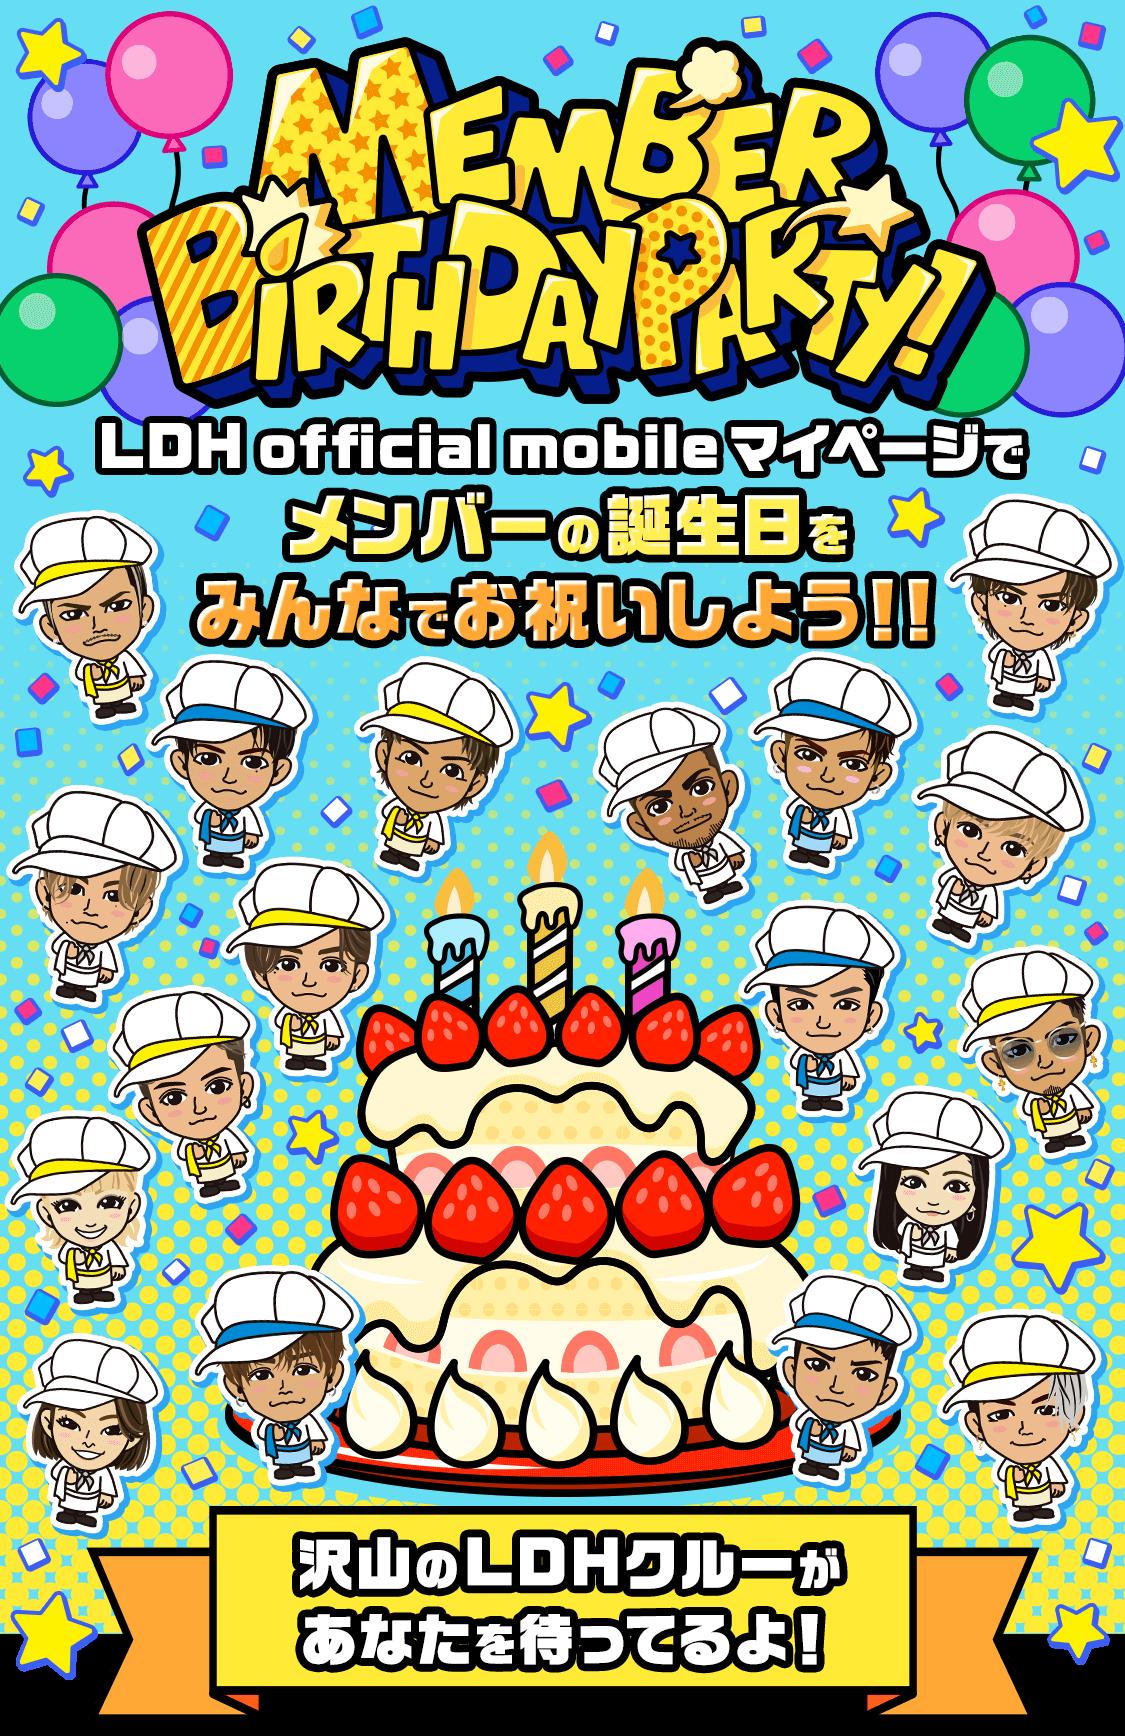 MEMBER BIRTHDAY PARTY!!